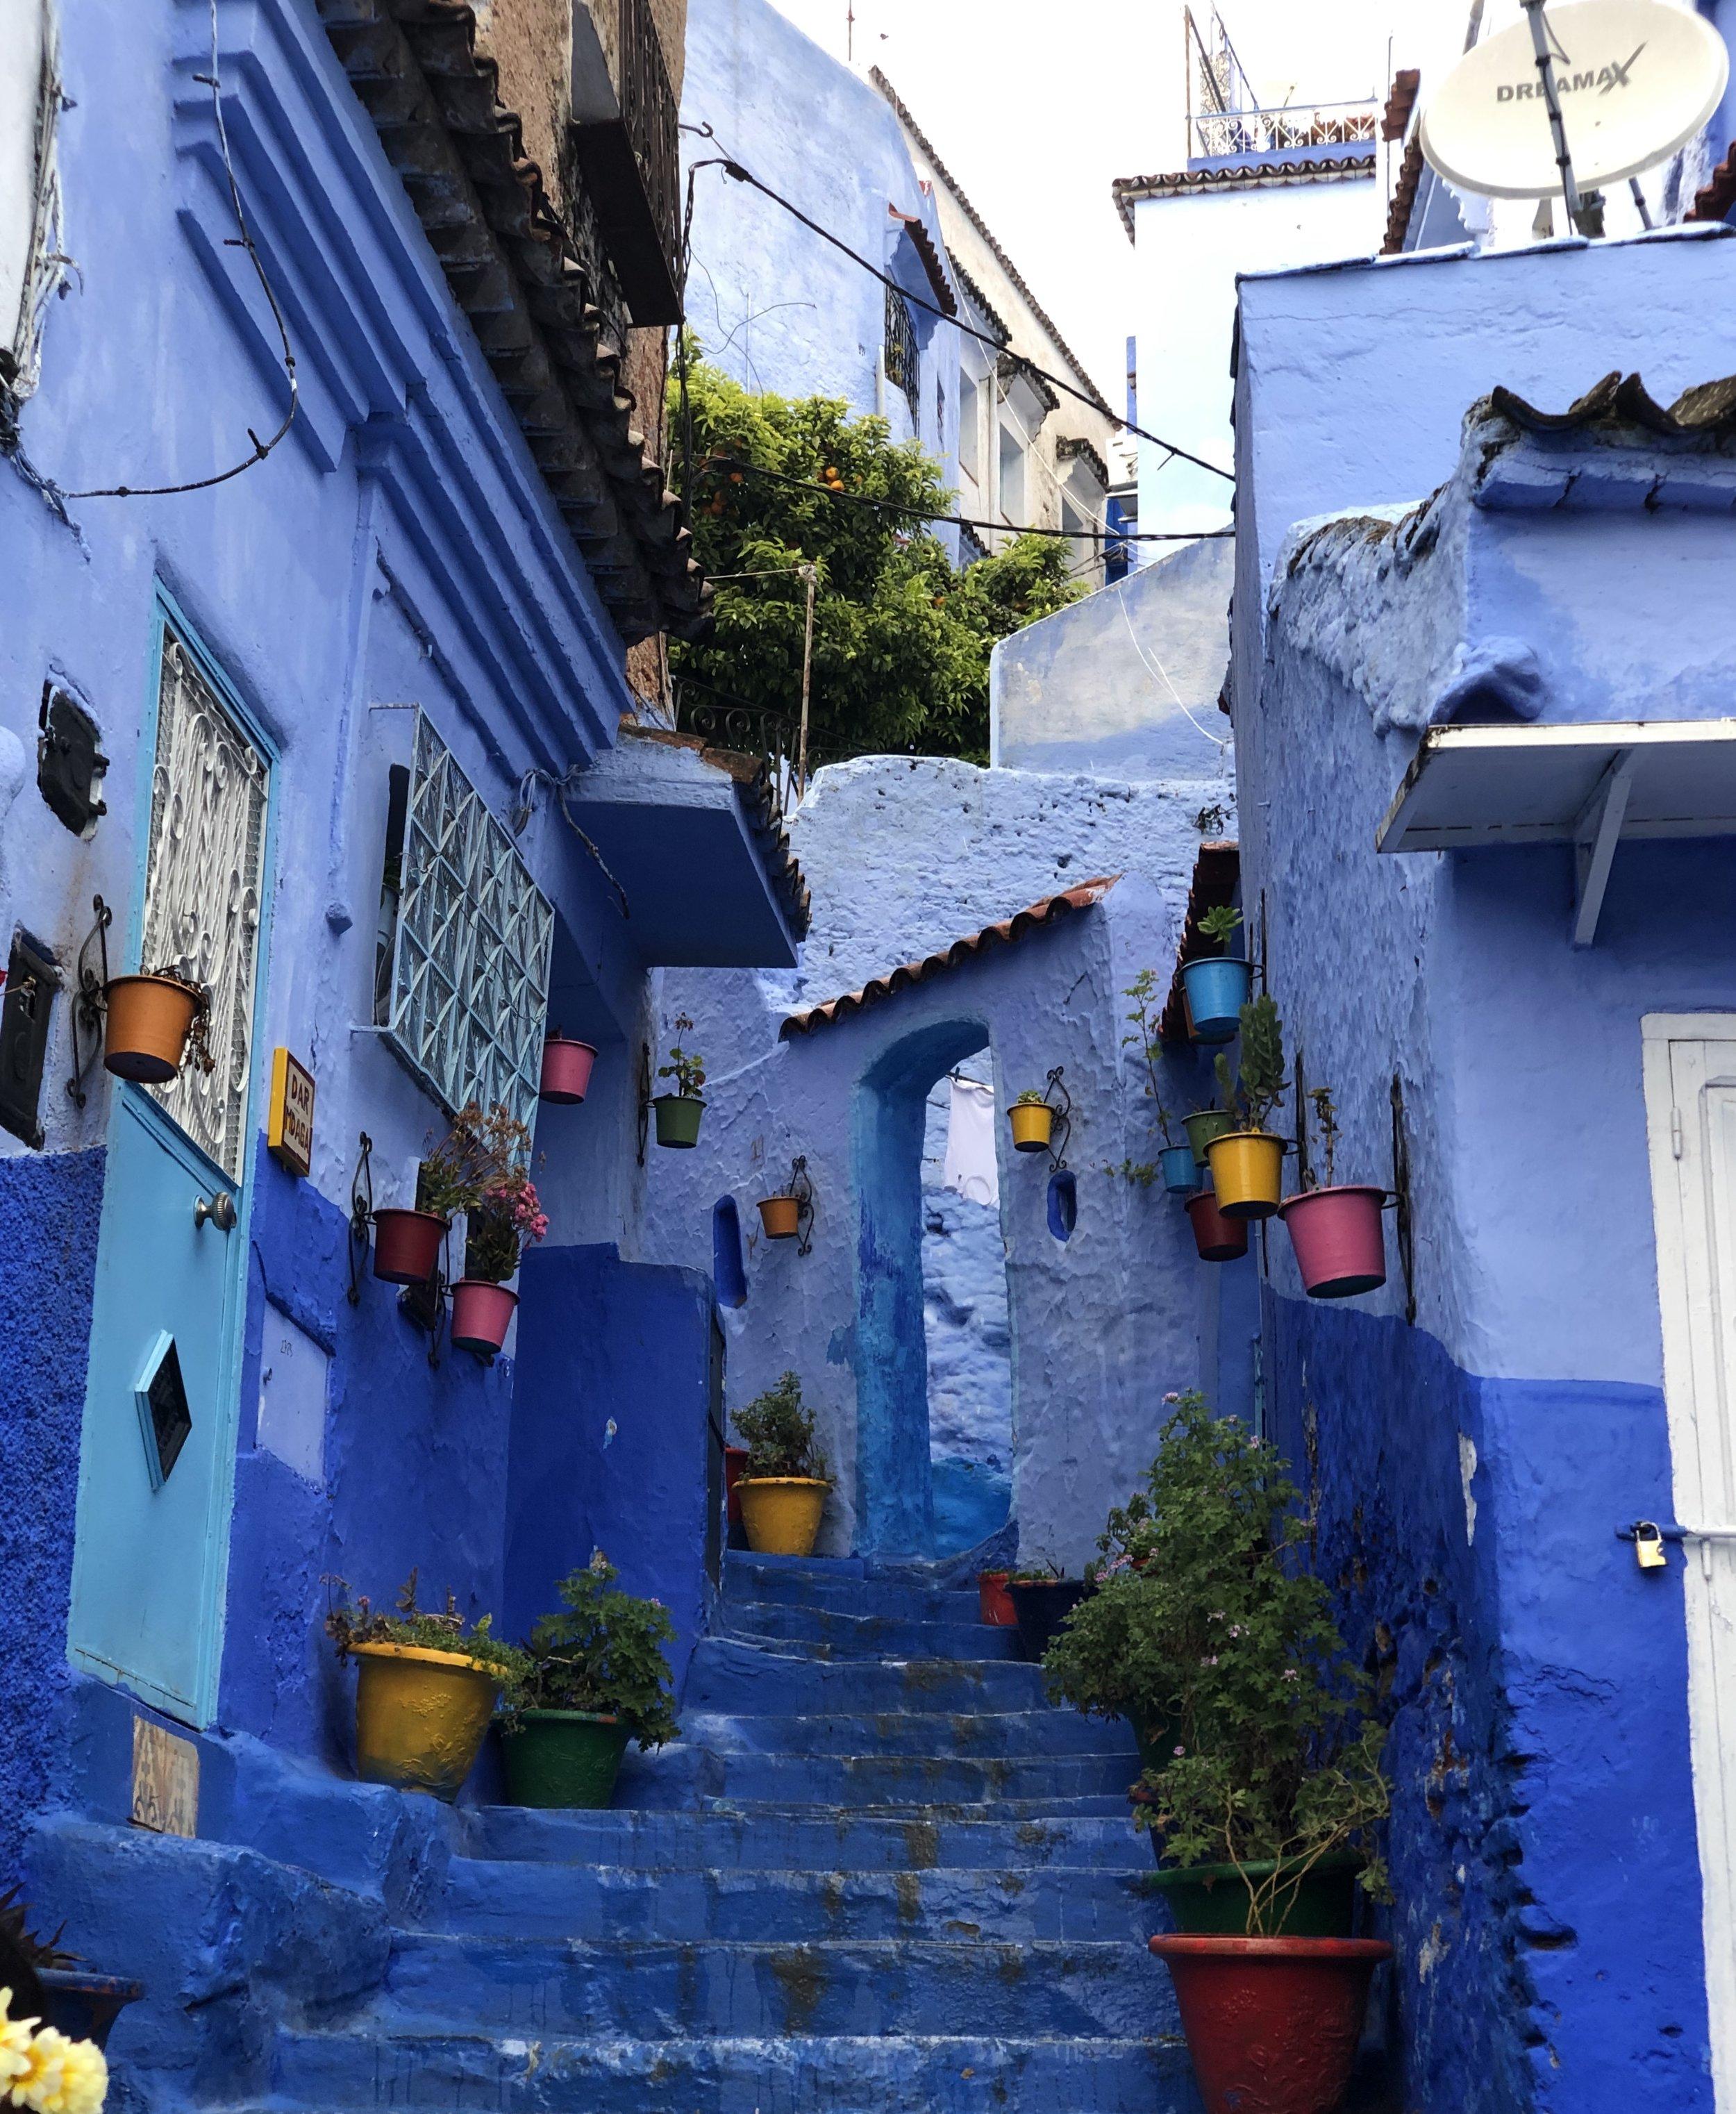 morocco instagram city.jpg